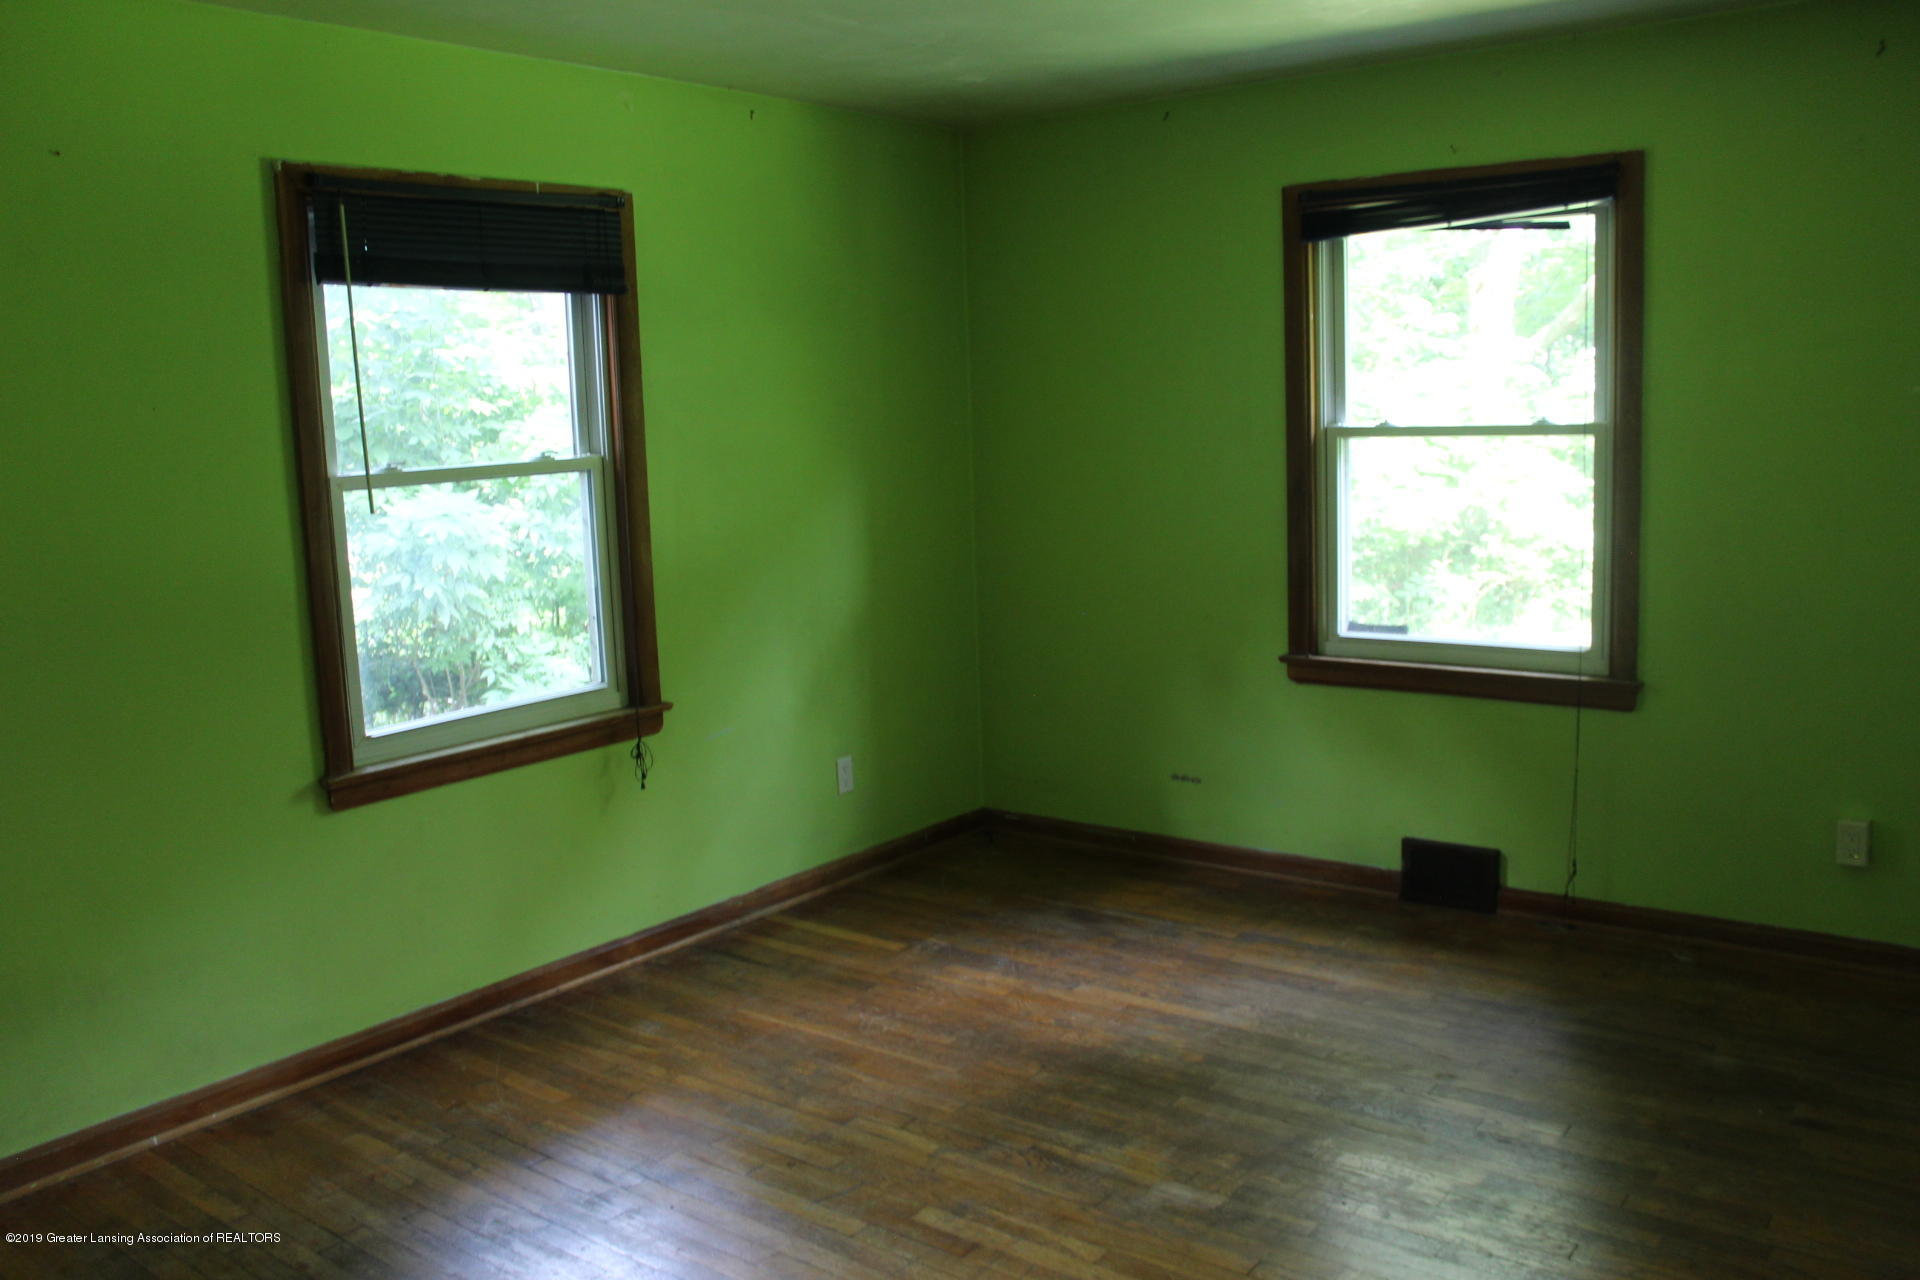 234 N Hagadorn Rd - Bedroom 1 - 6